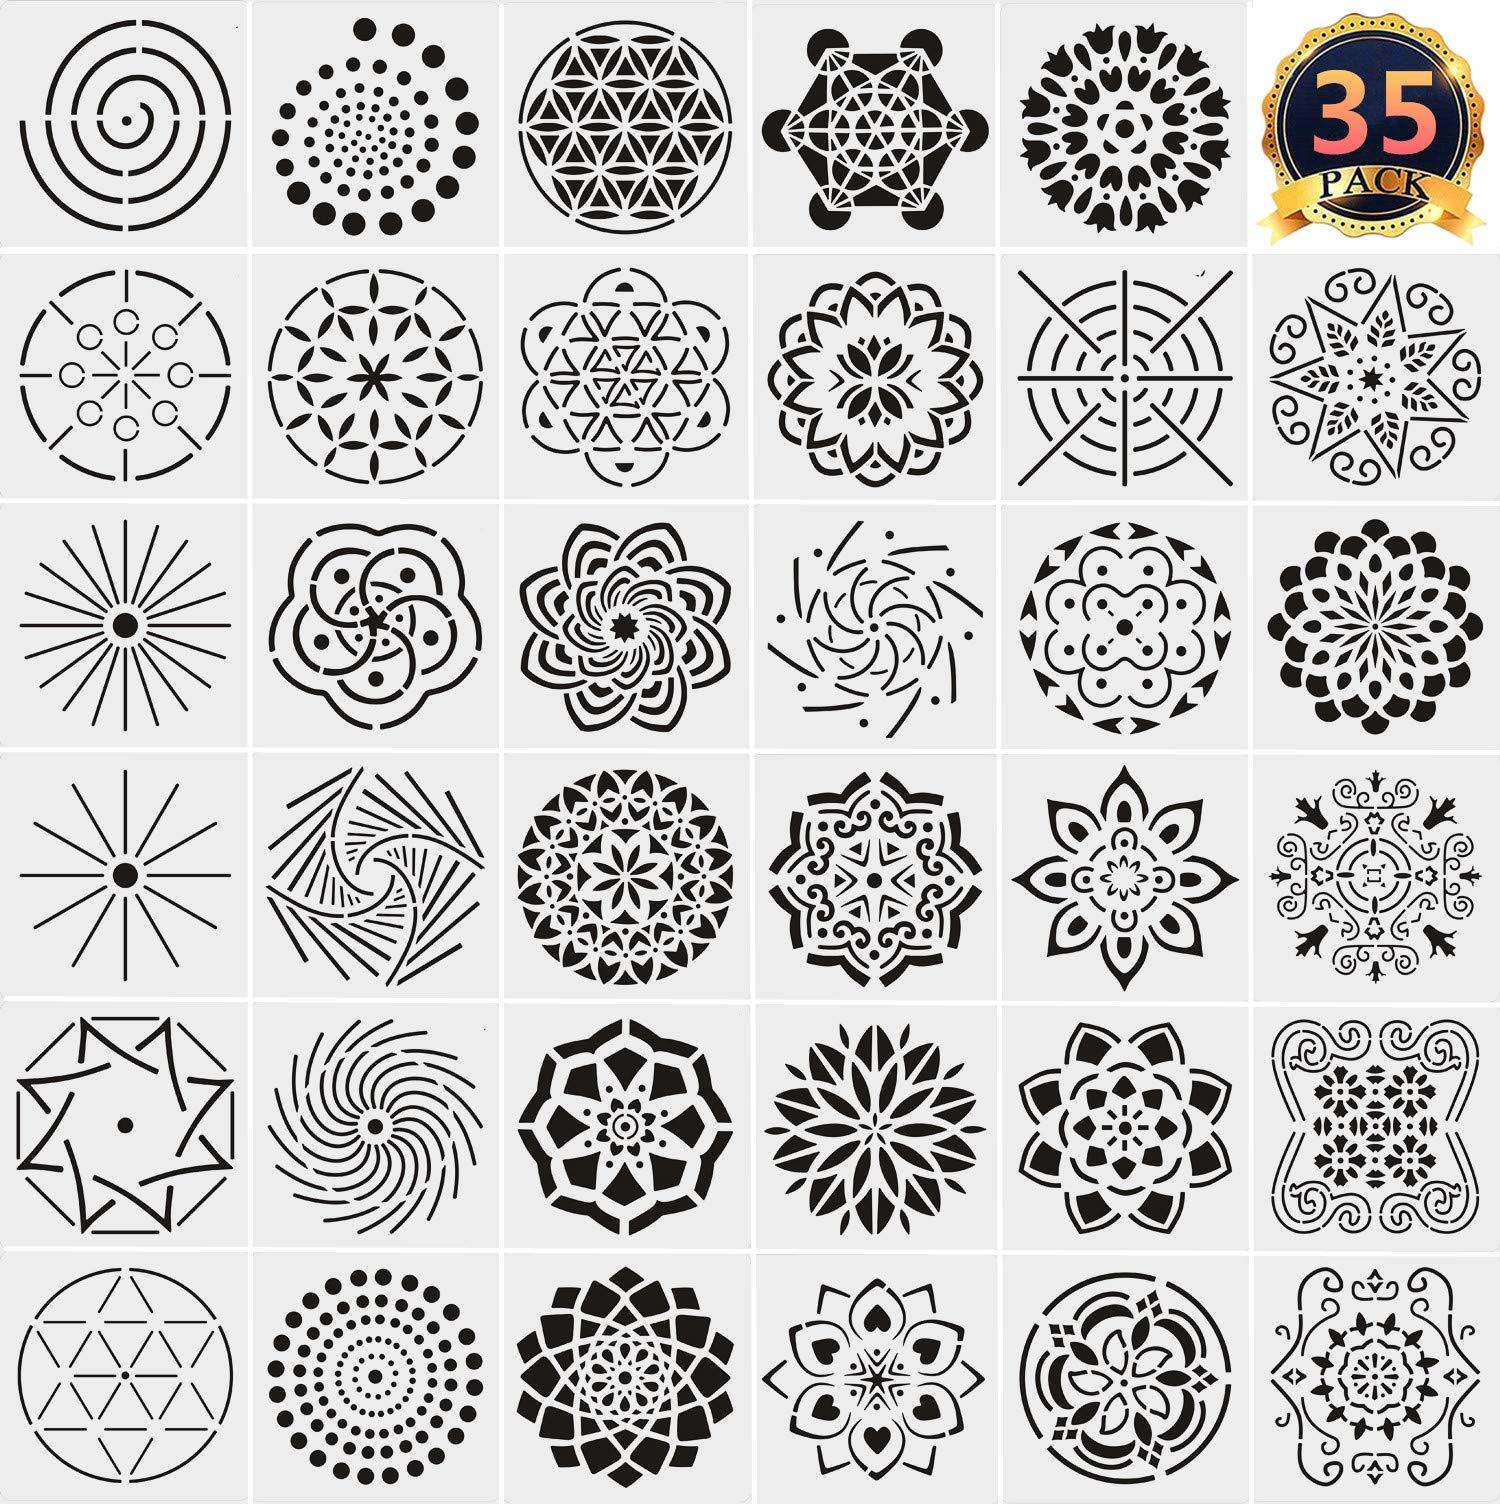 35 Pack Mandala Dotting Stencils Template, Mandala Dotting Stencils Mandala Dot Painting Stencils Painting Stencils for Painting on Wood, Airbrush and Walls Art by Feeke